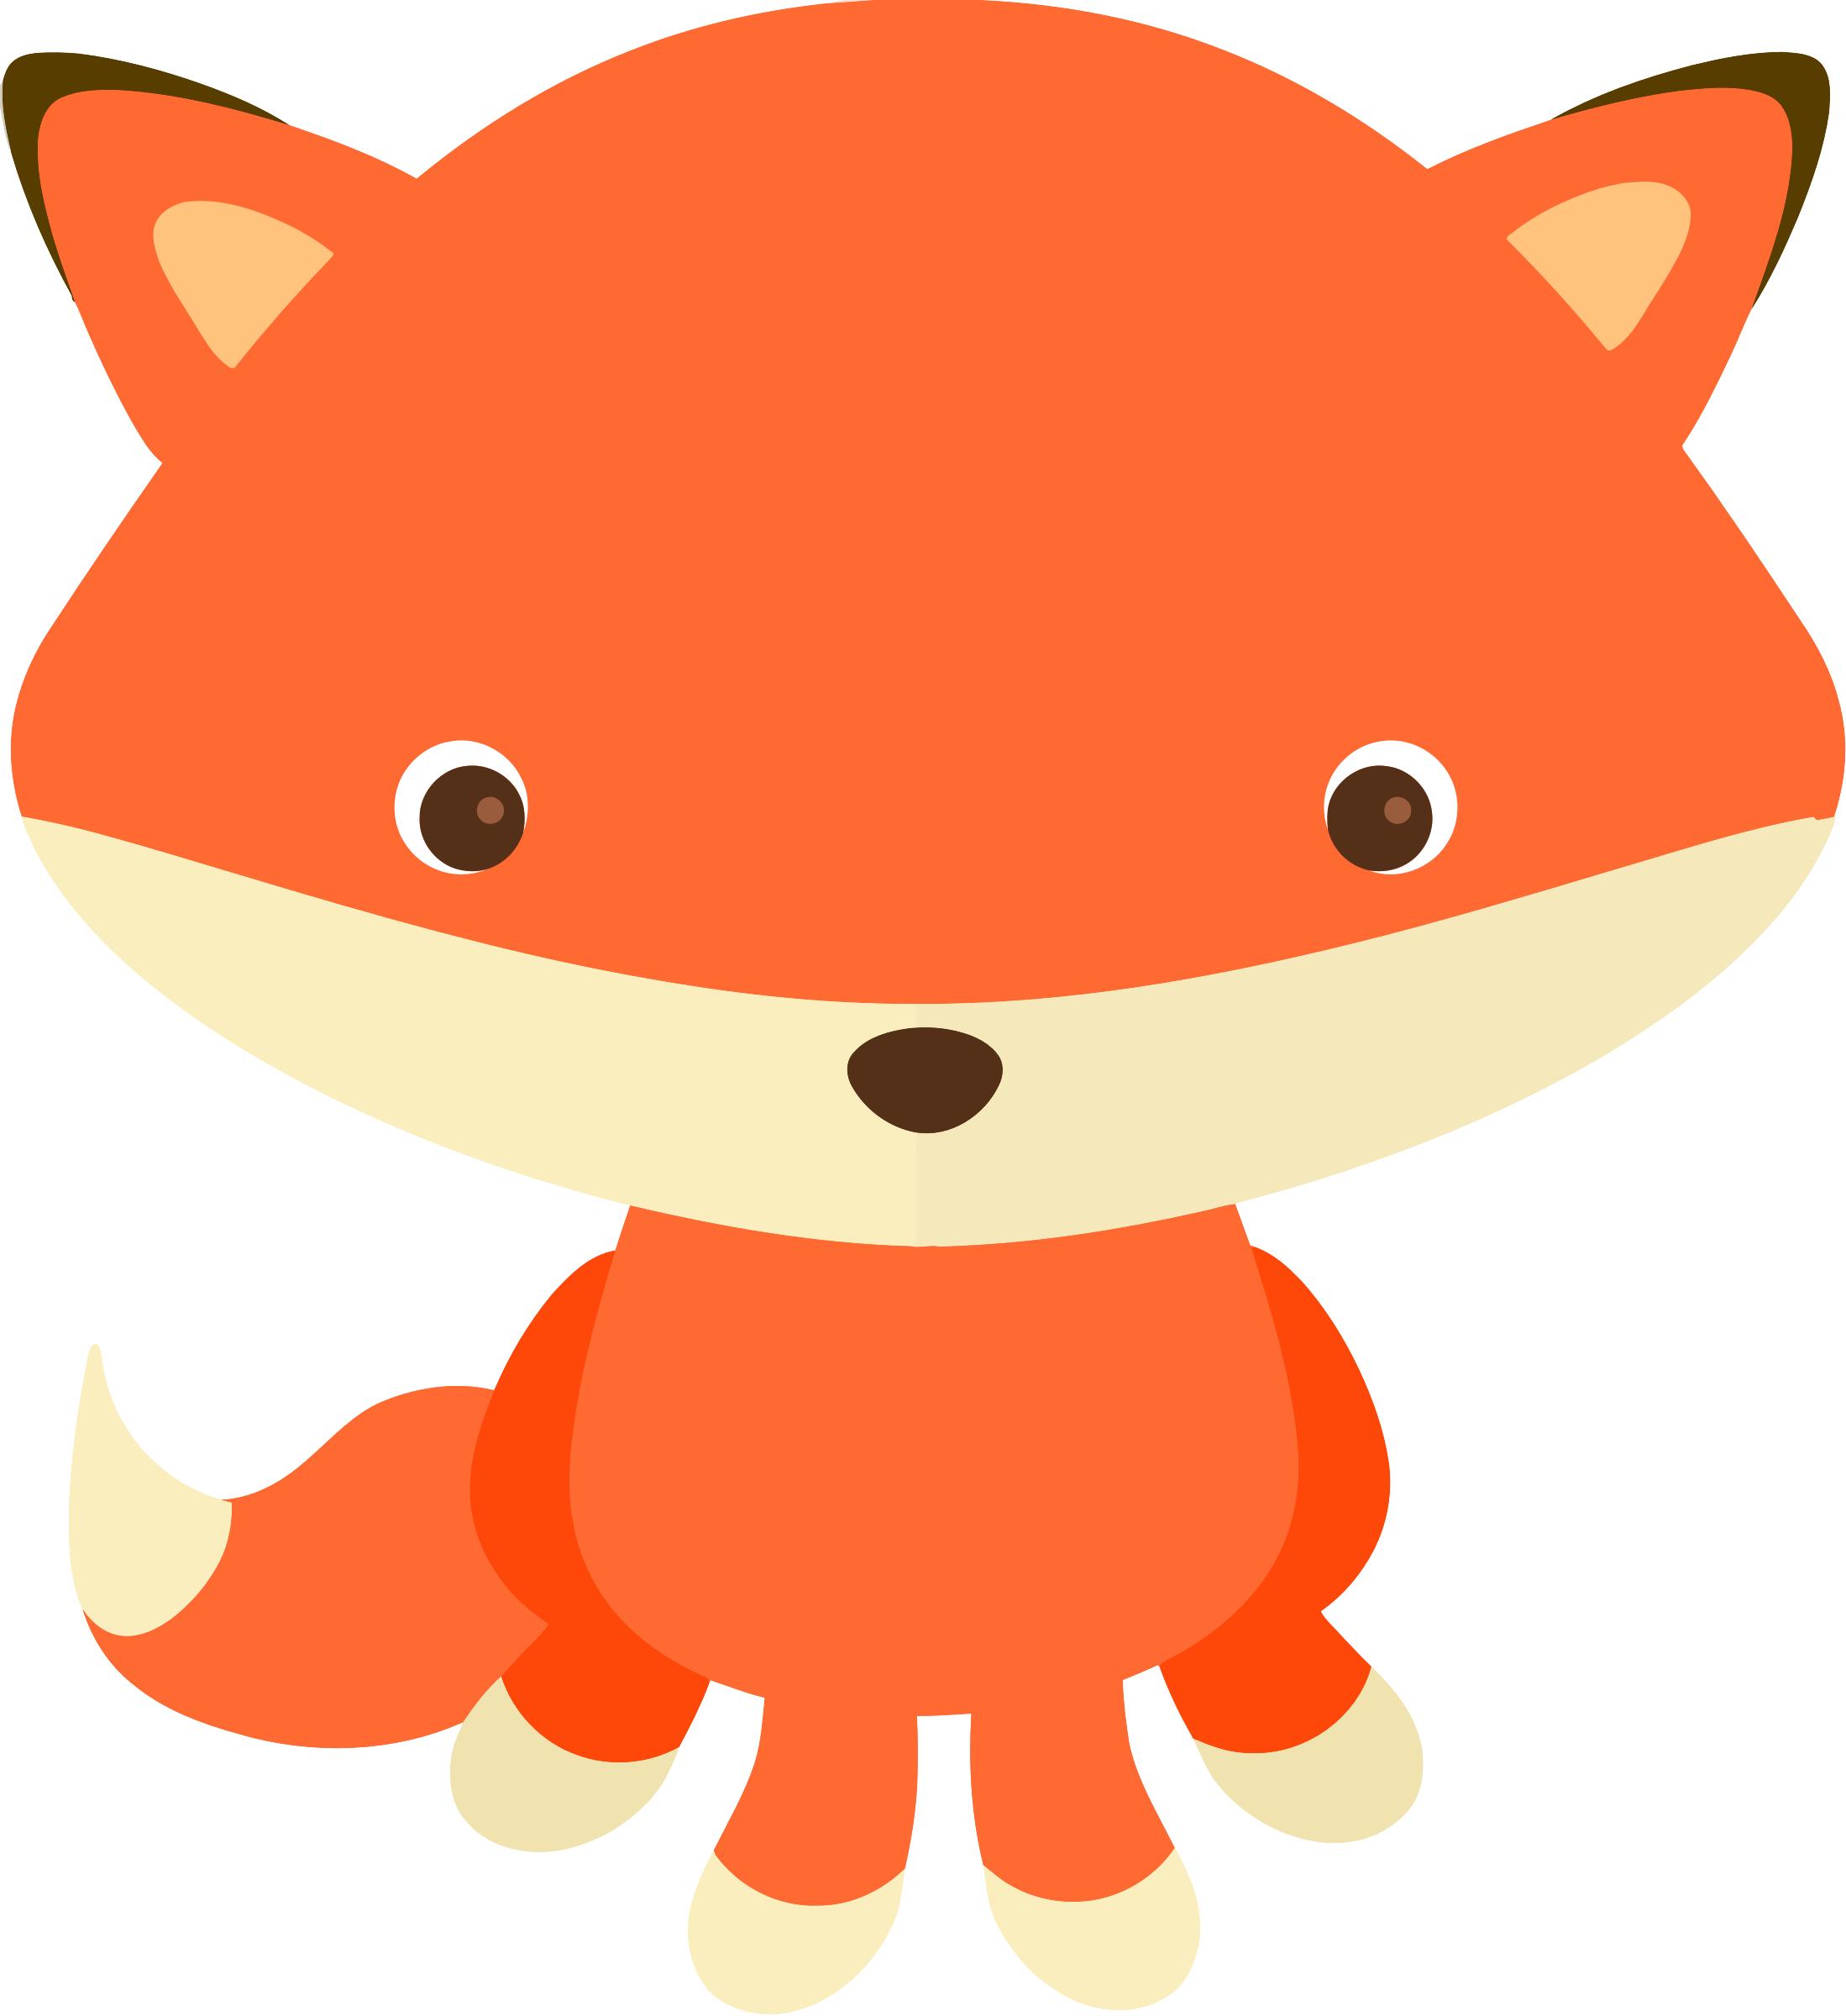 2198x2400 Fox By @kbj 77, I Cute Little Fox I Made For A Clipart Set Of Mine